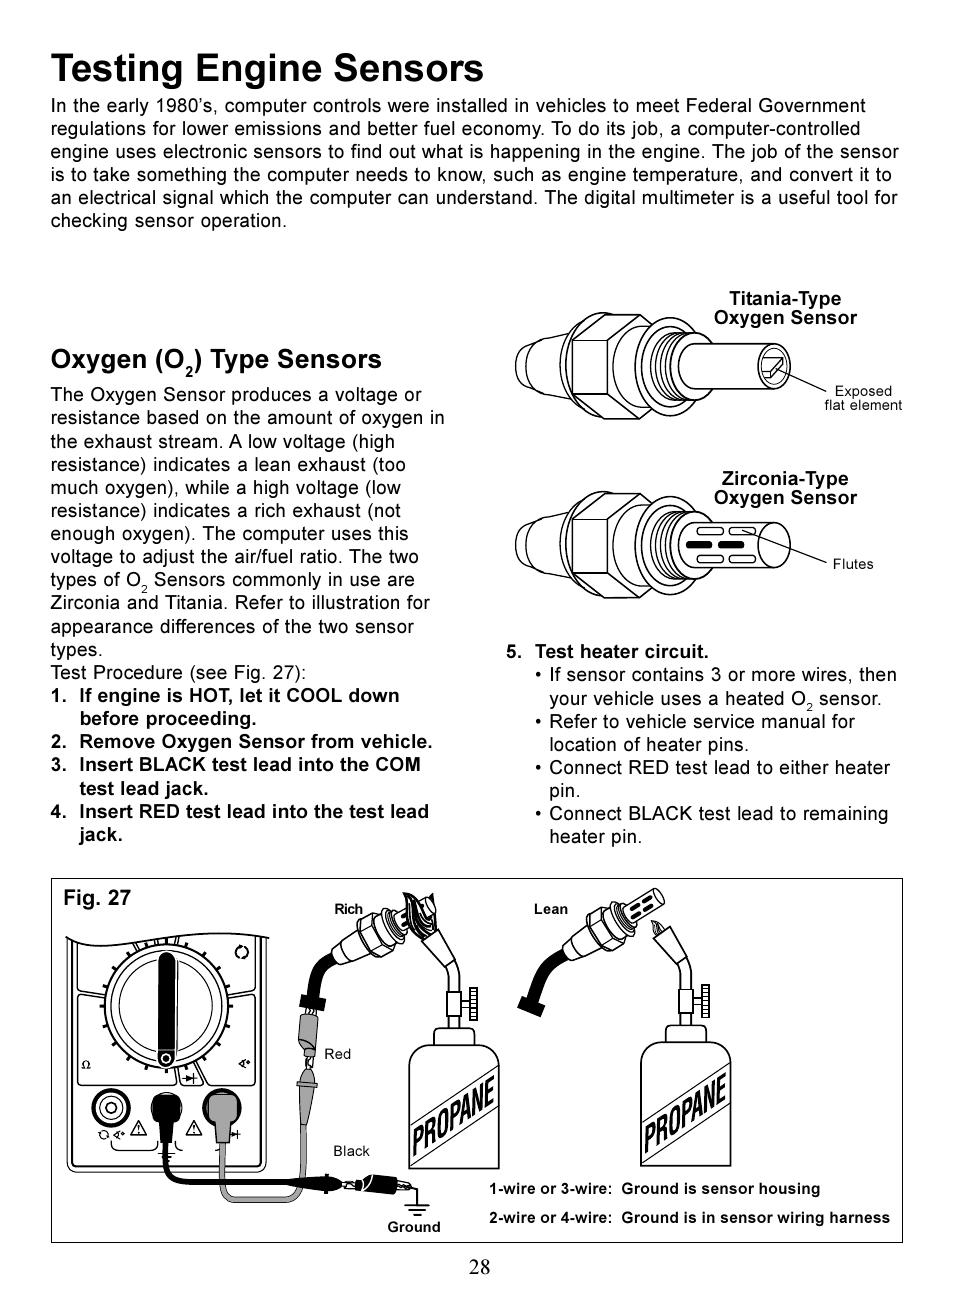 Testing Engine Sensors Oxygen O Type Actron Digital 3 Wire O2 Sensor Wiring Diagram Fig 27